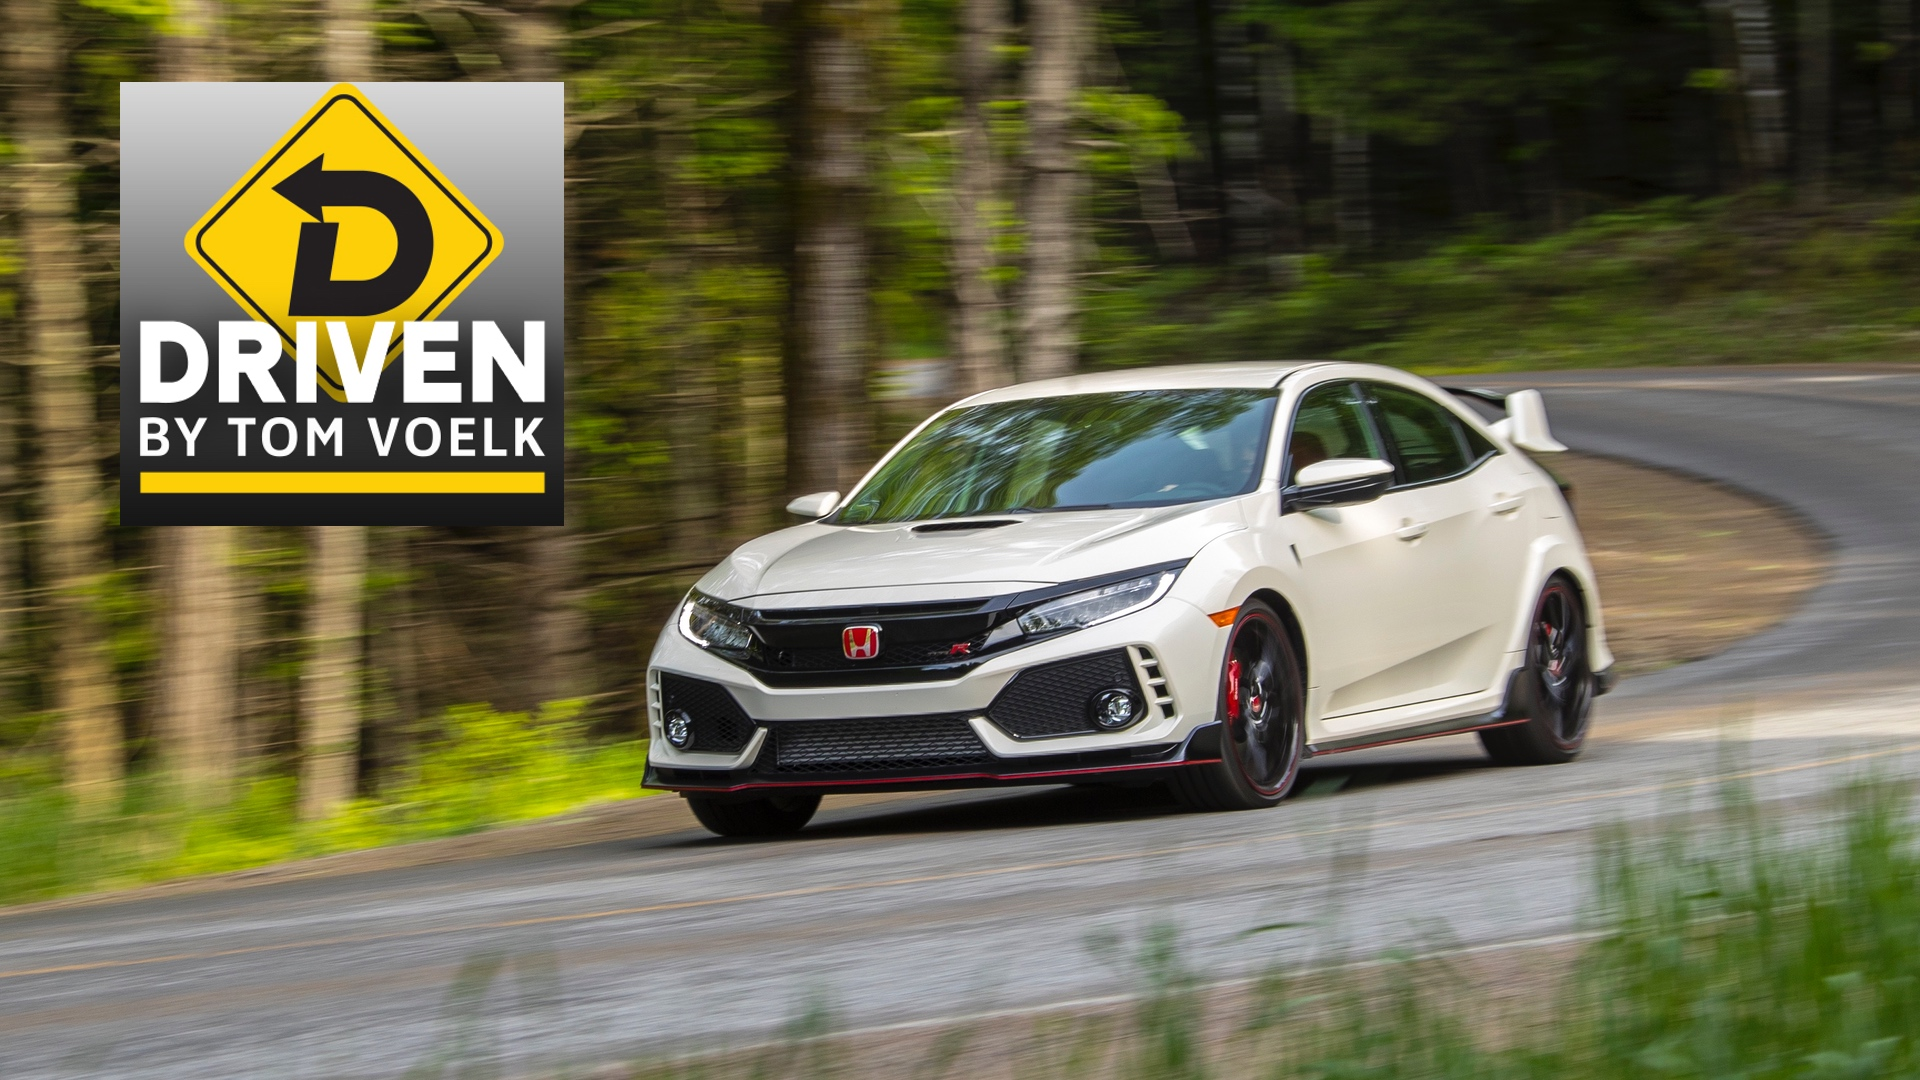 Artwork for 2018 Honda Civic Type R